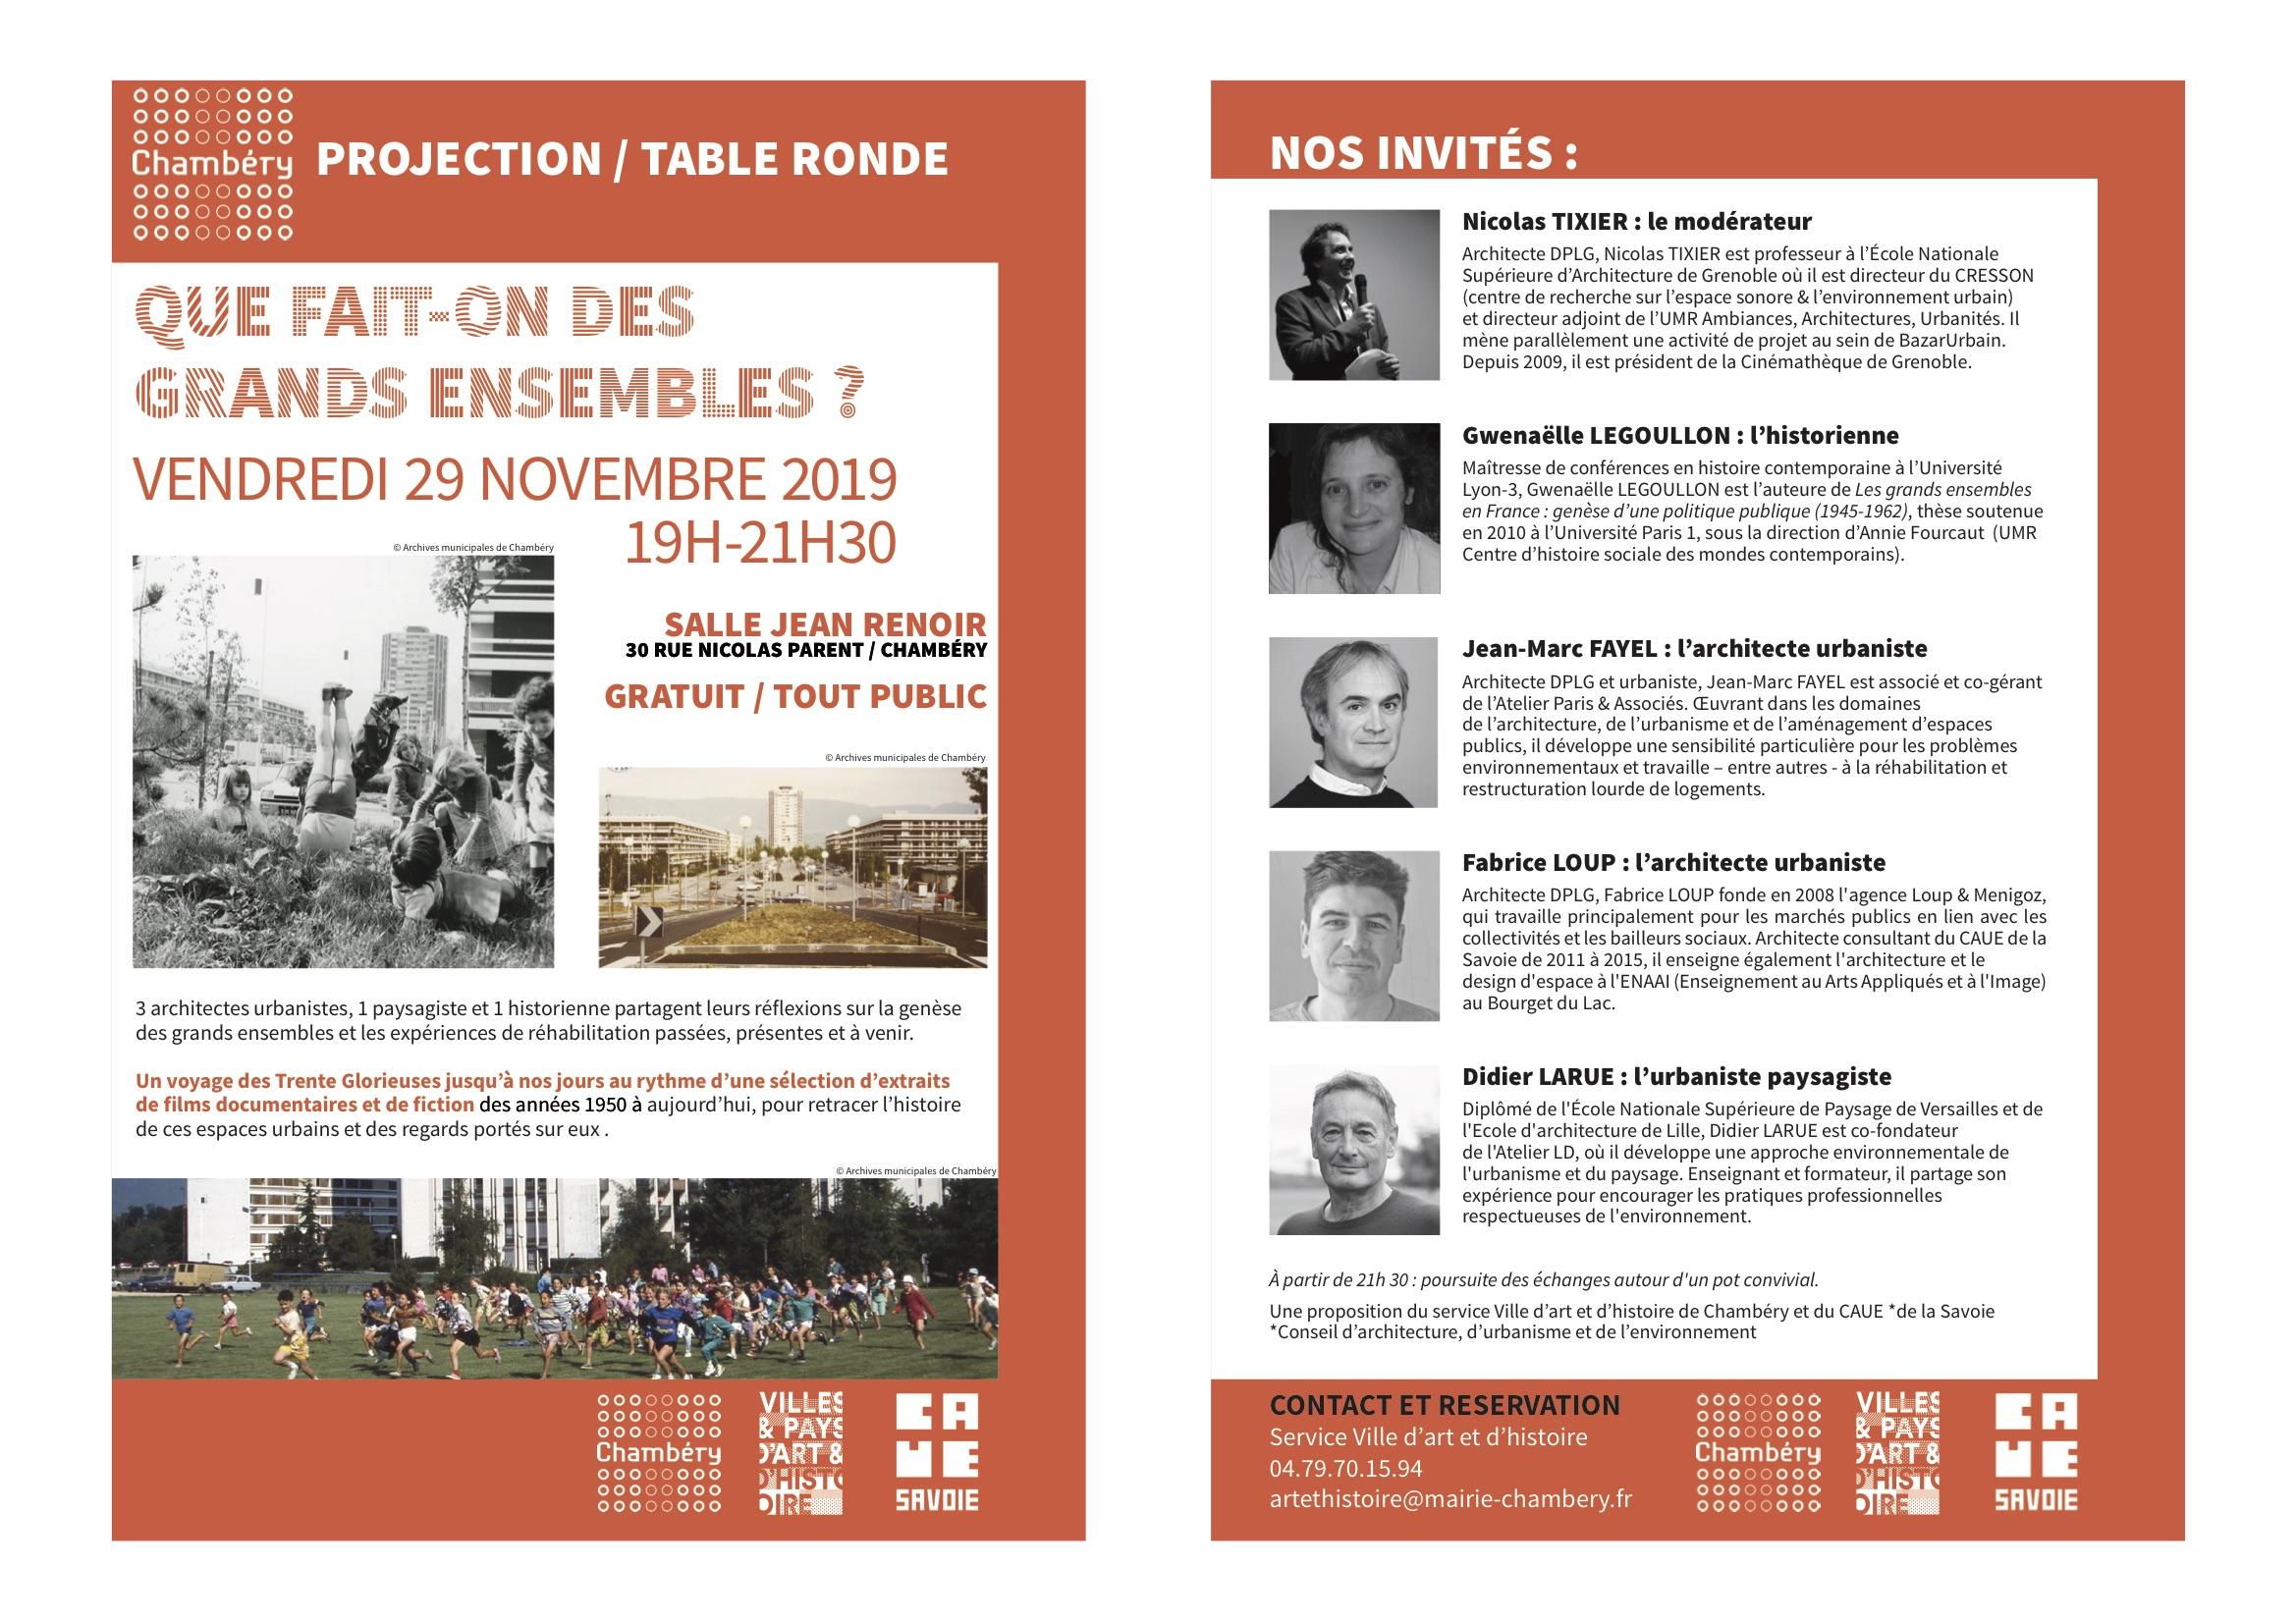 flyer au format pdf